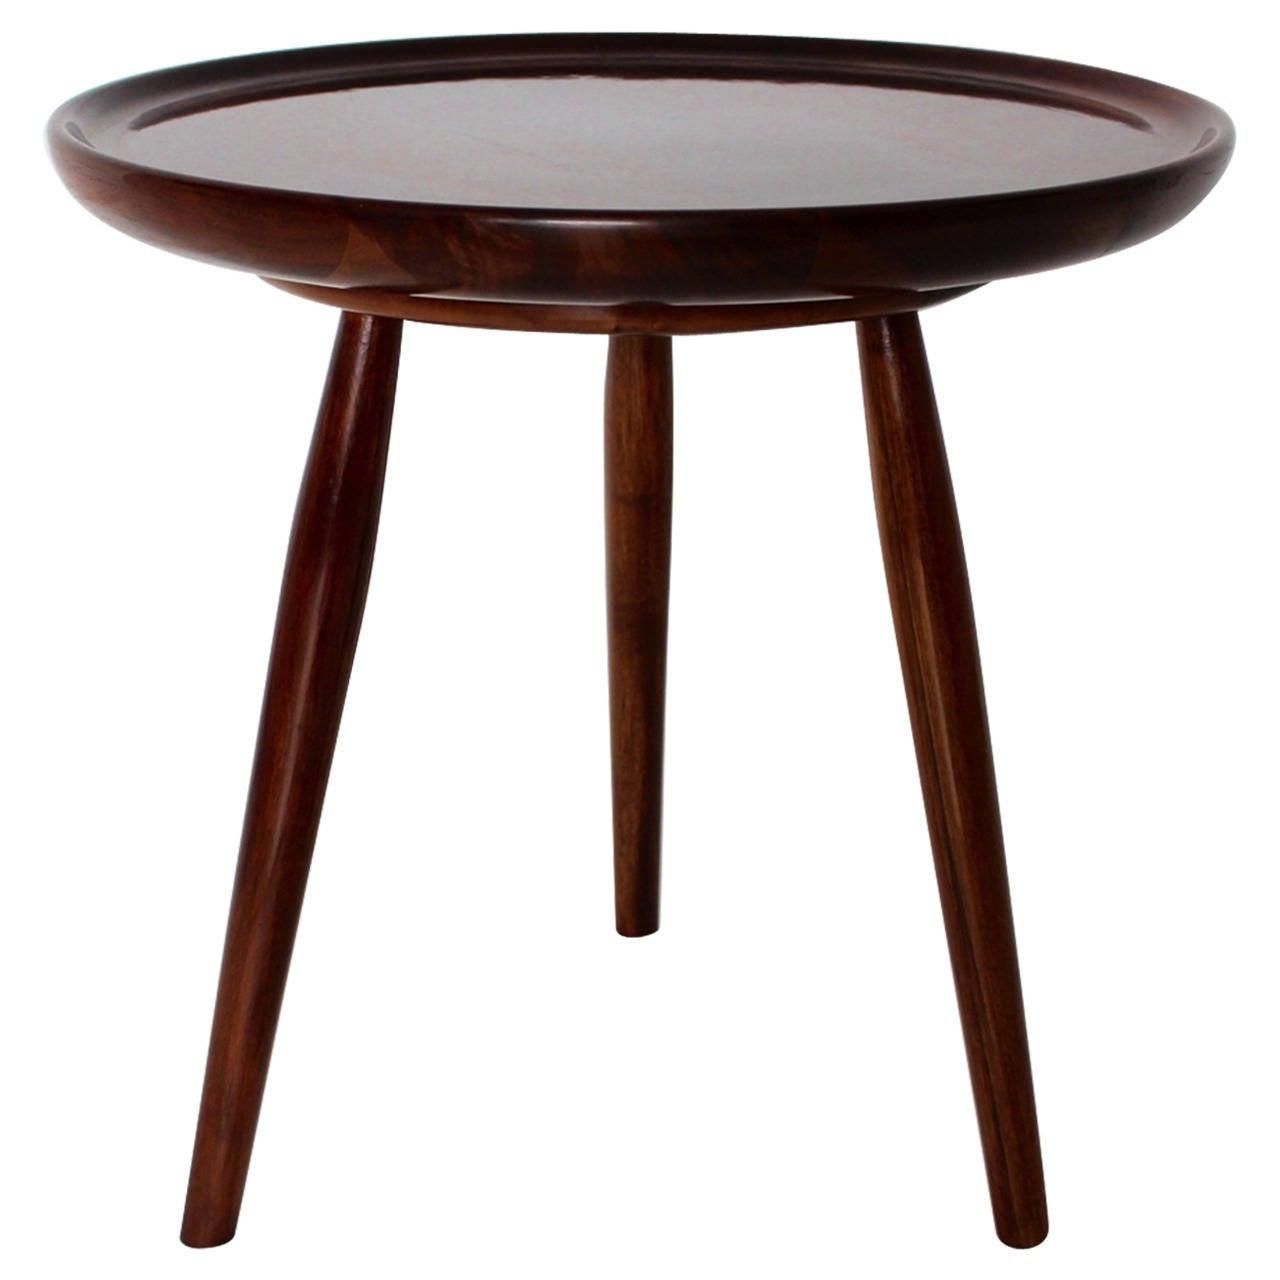 Art deco walnut coffee table by josef frank vienna for Walnut coffee table